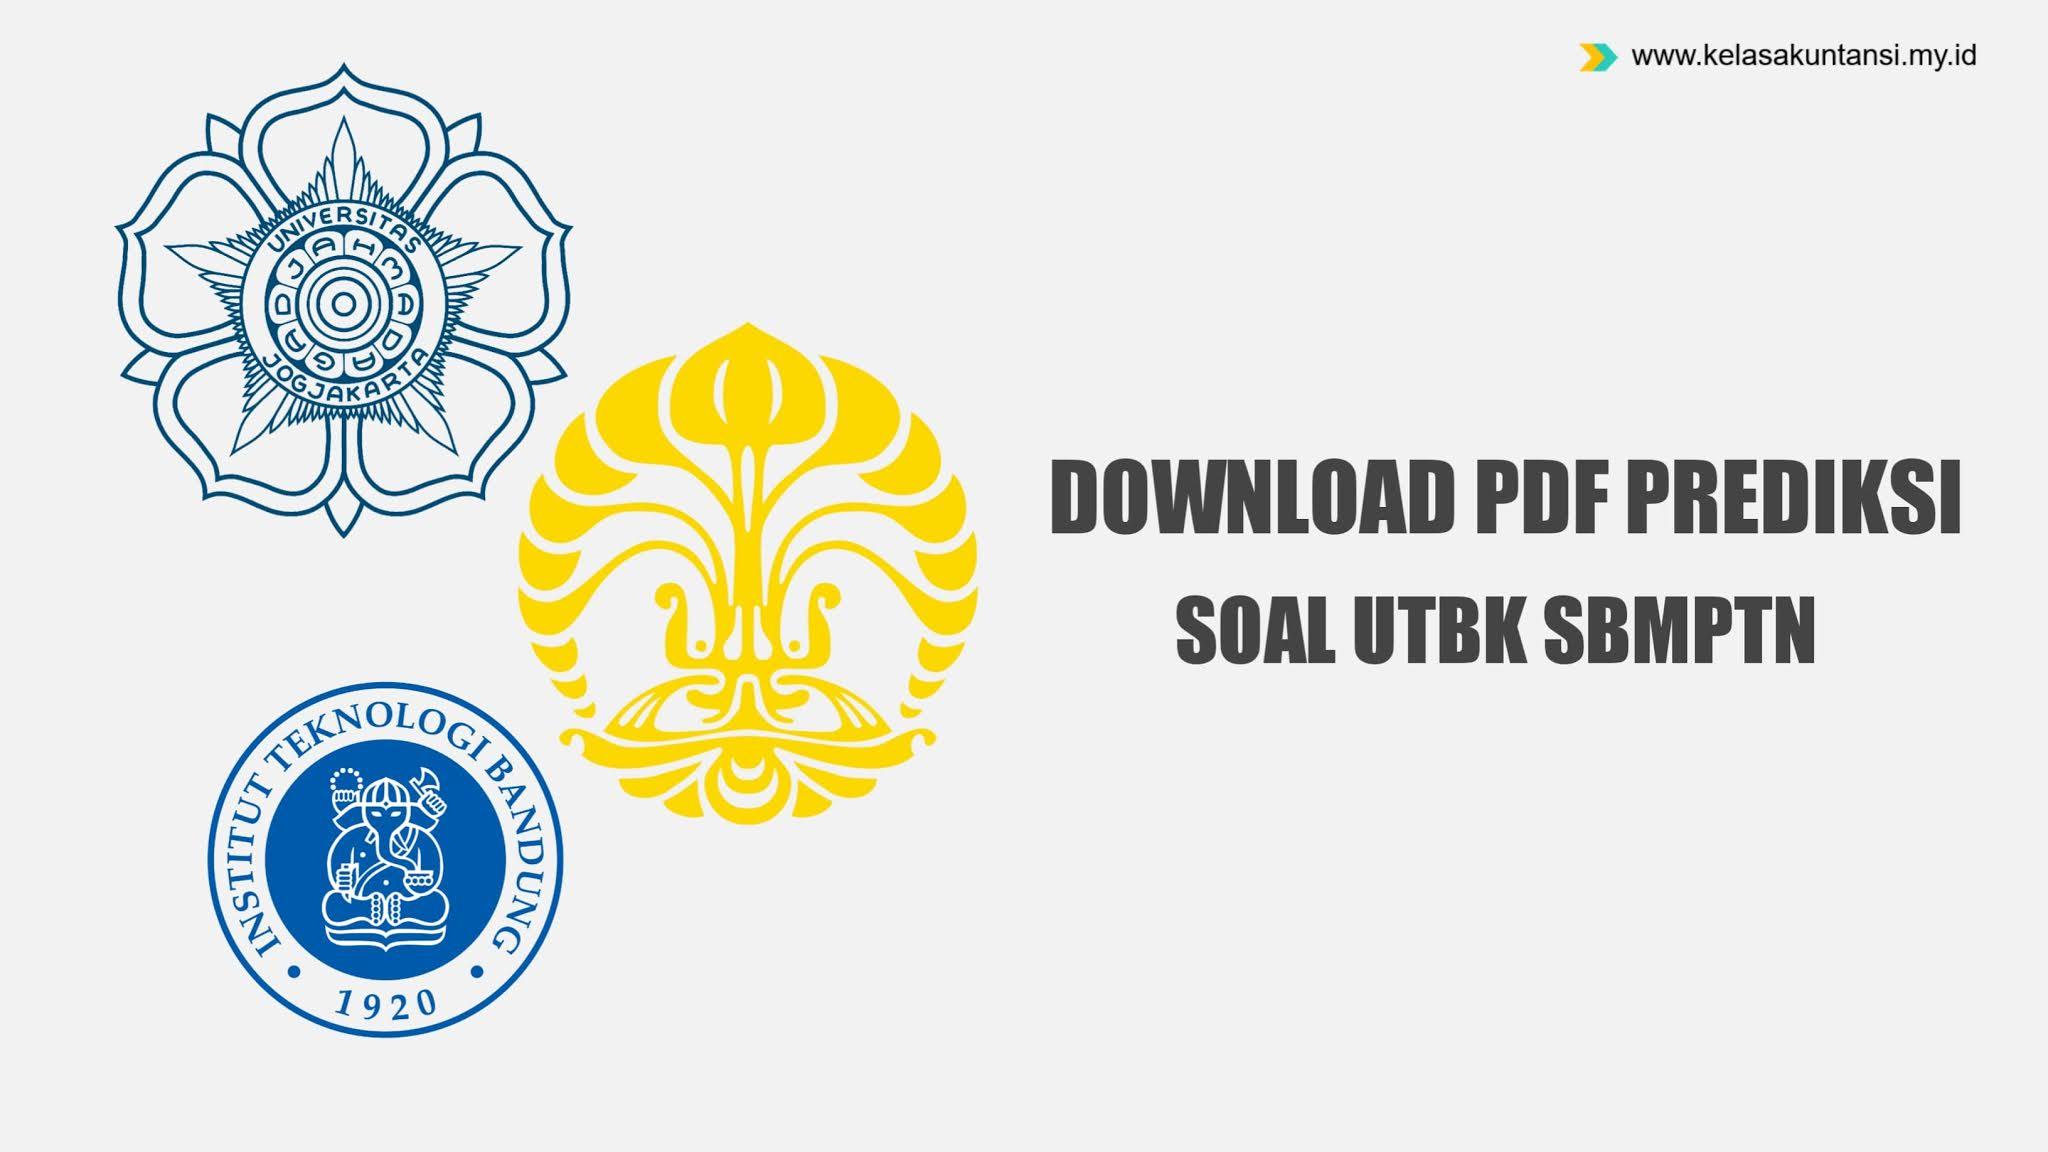 Download Kumpulan PDF Prediksi Soal SBMPTN 2021